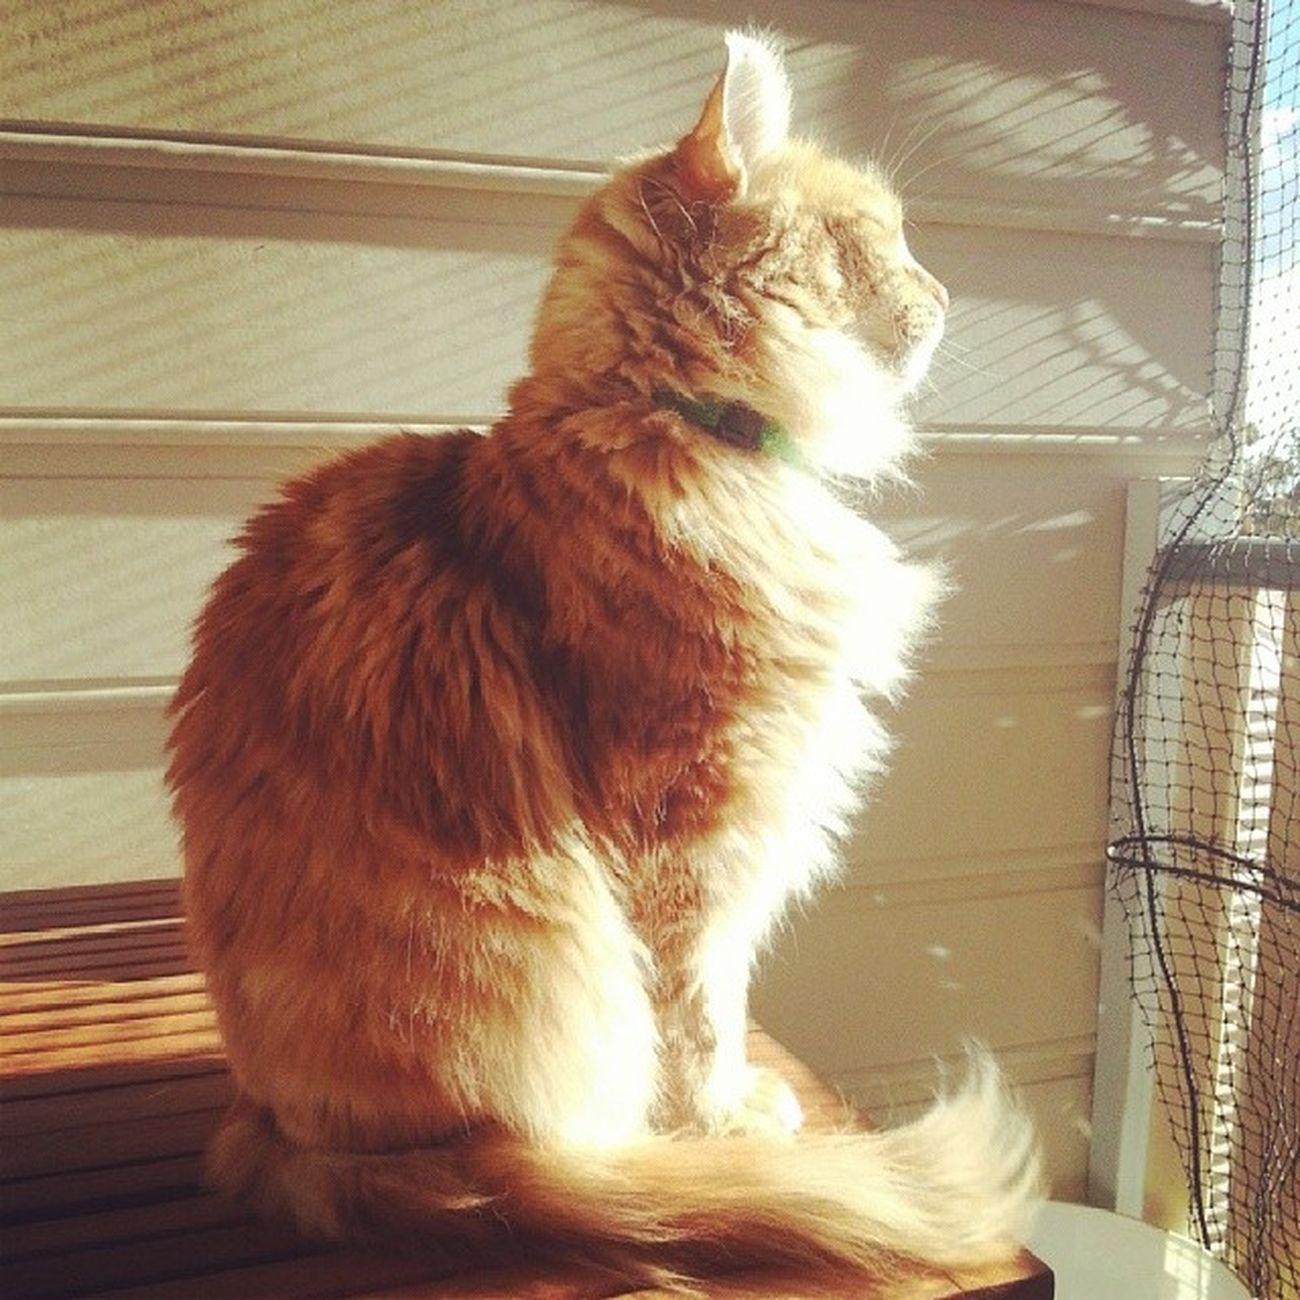 Jaffa aka Mrmcbitey has found himself a nice spot in the Sunshine too